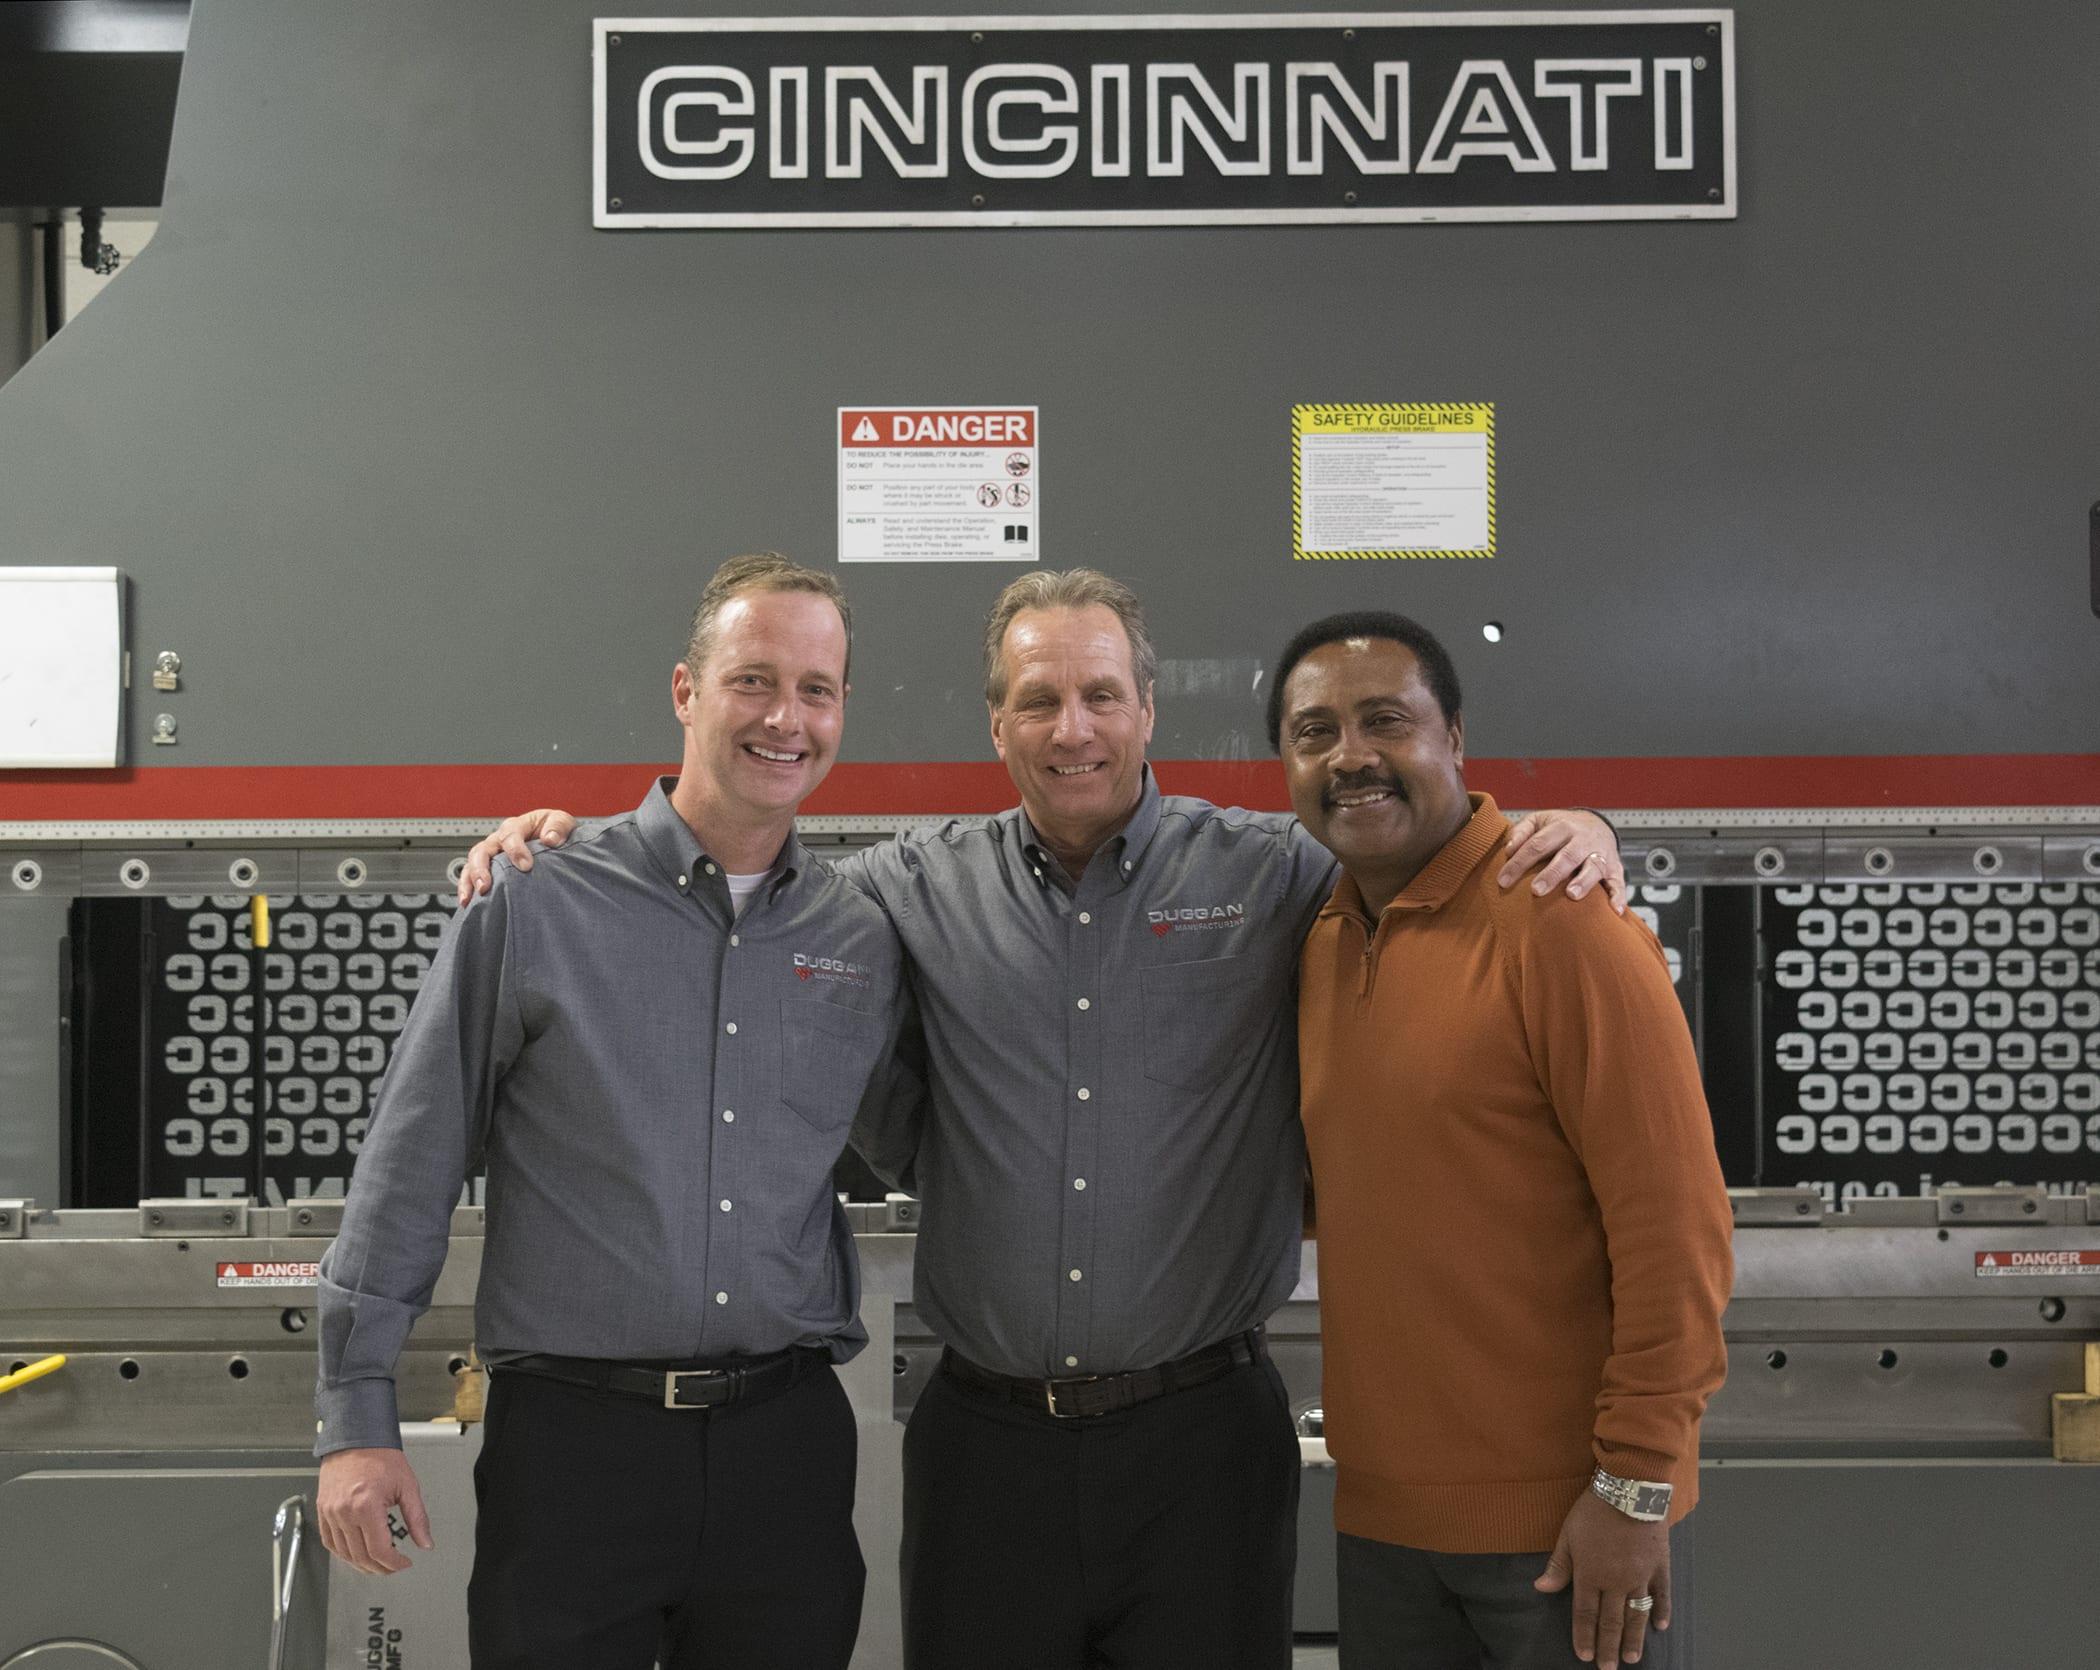 Manufacturing Executives in front of Cincinnati CNC machine